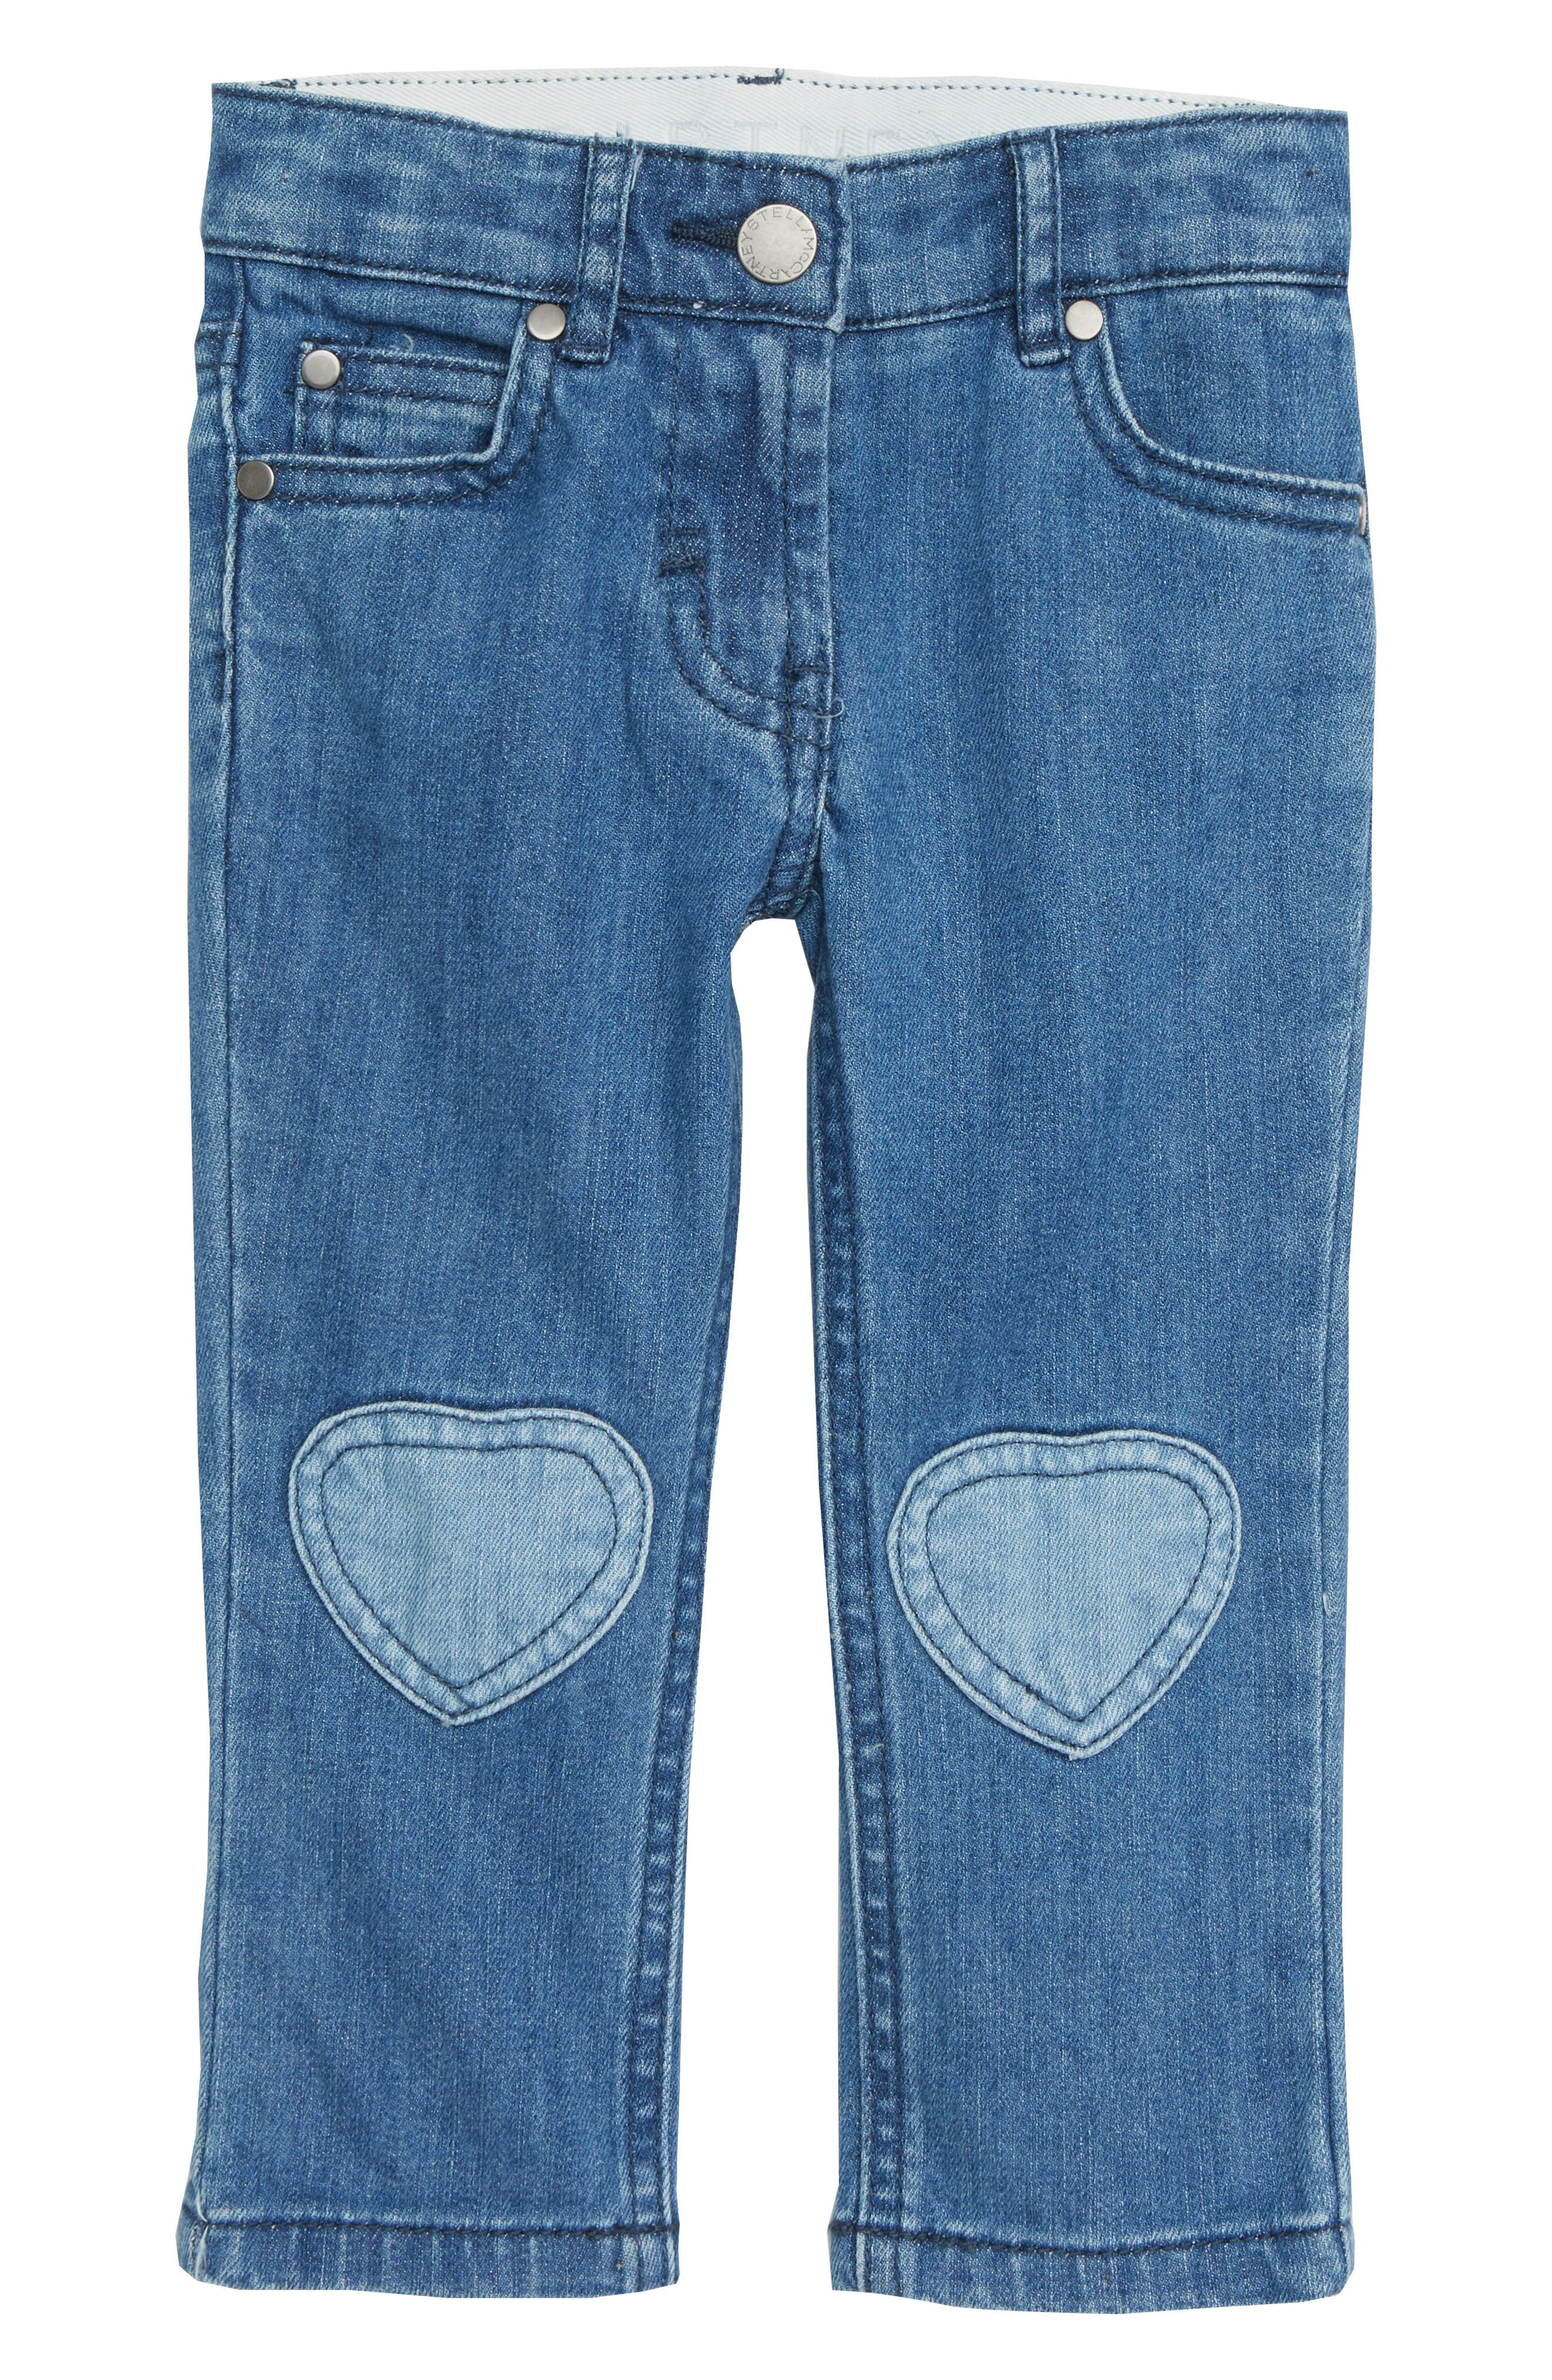 Heart Patch Straight Leg Jeans,                         Main,                         color, BLUE